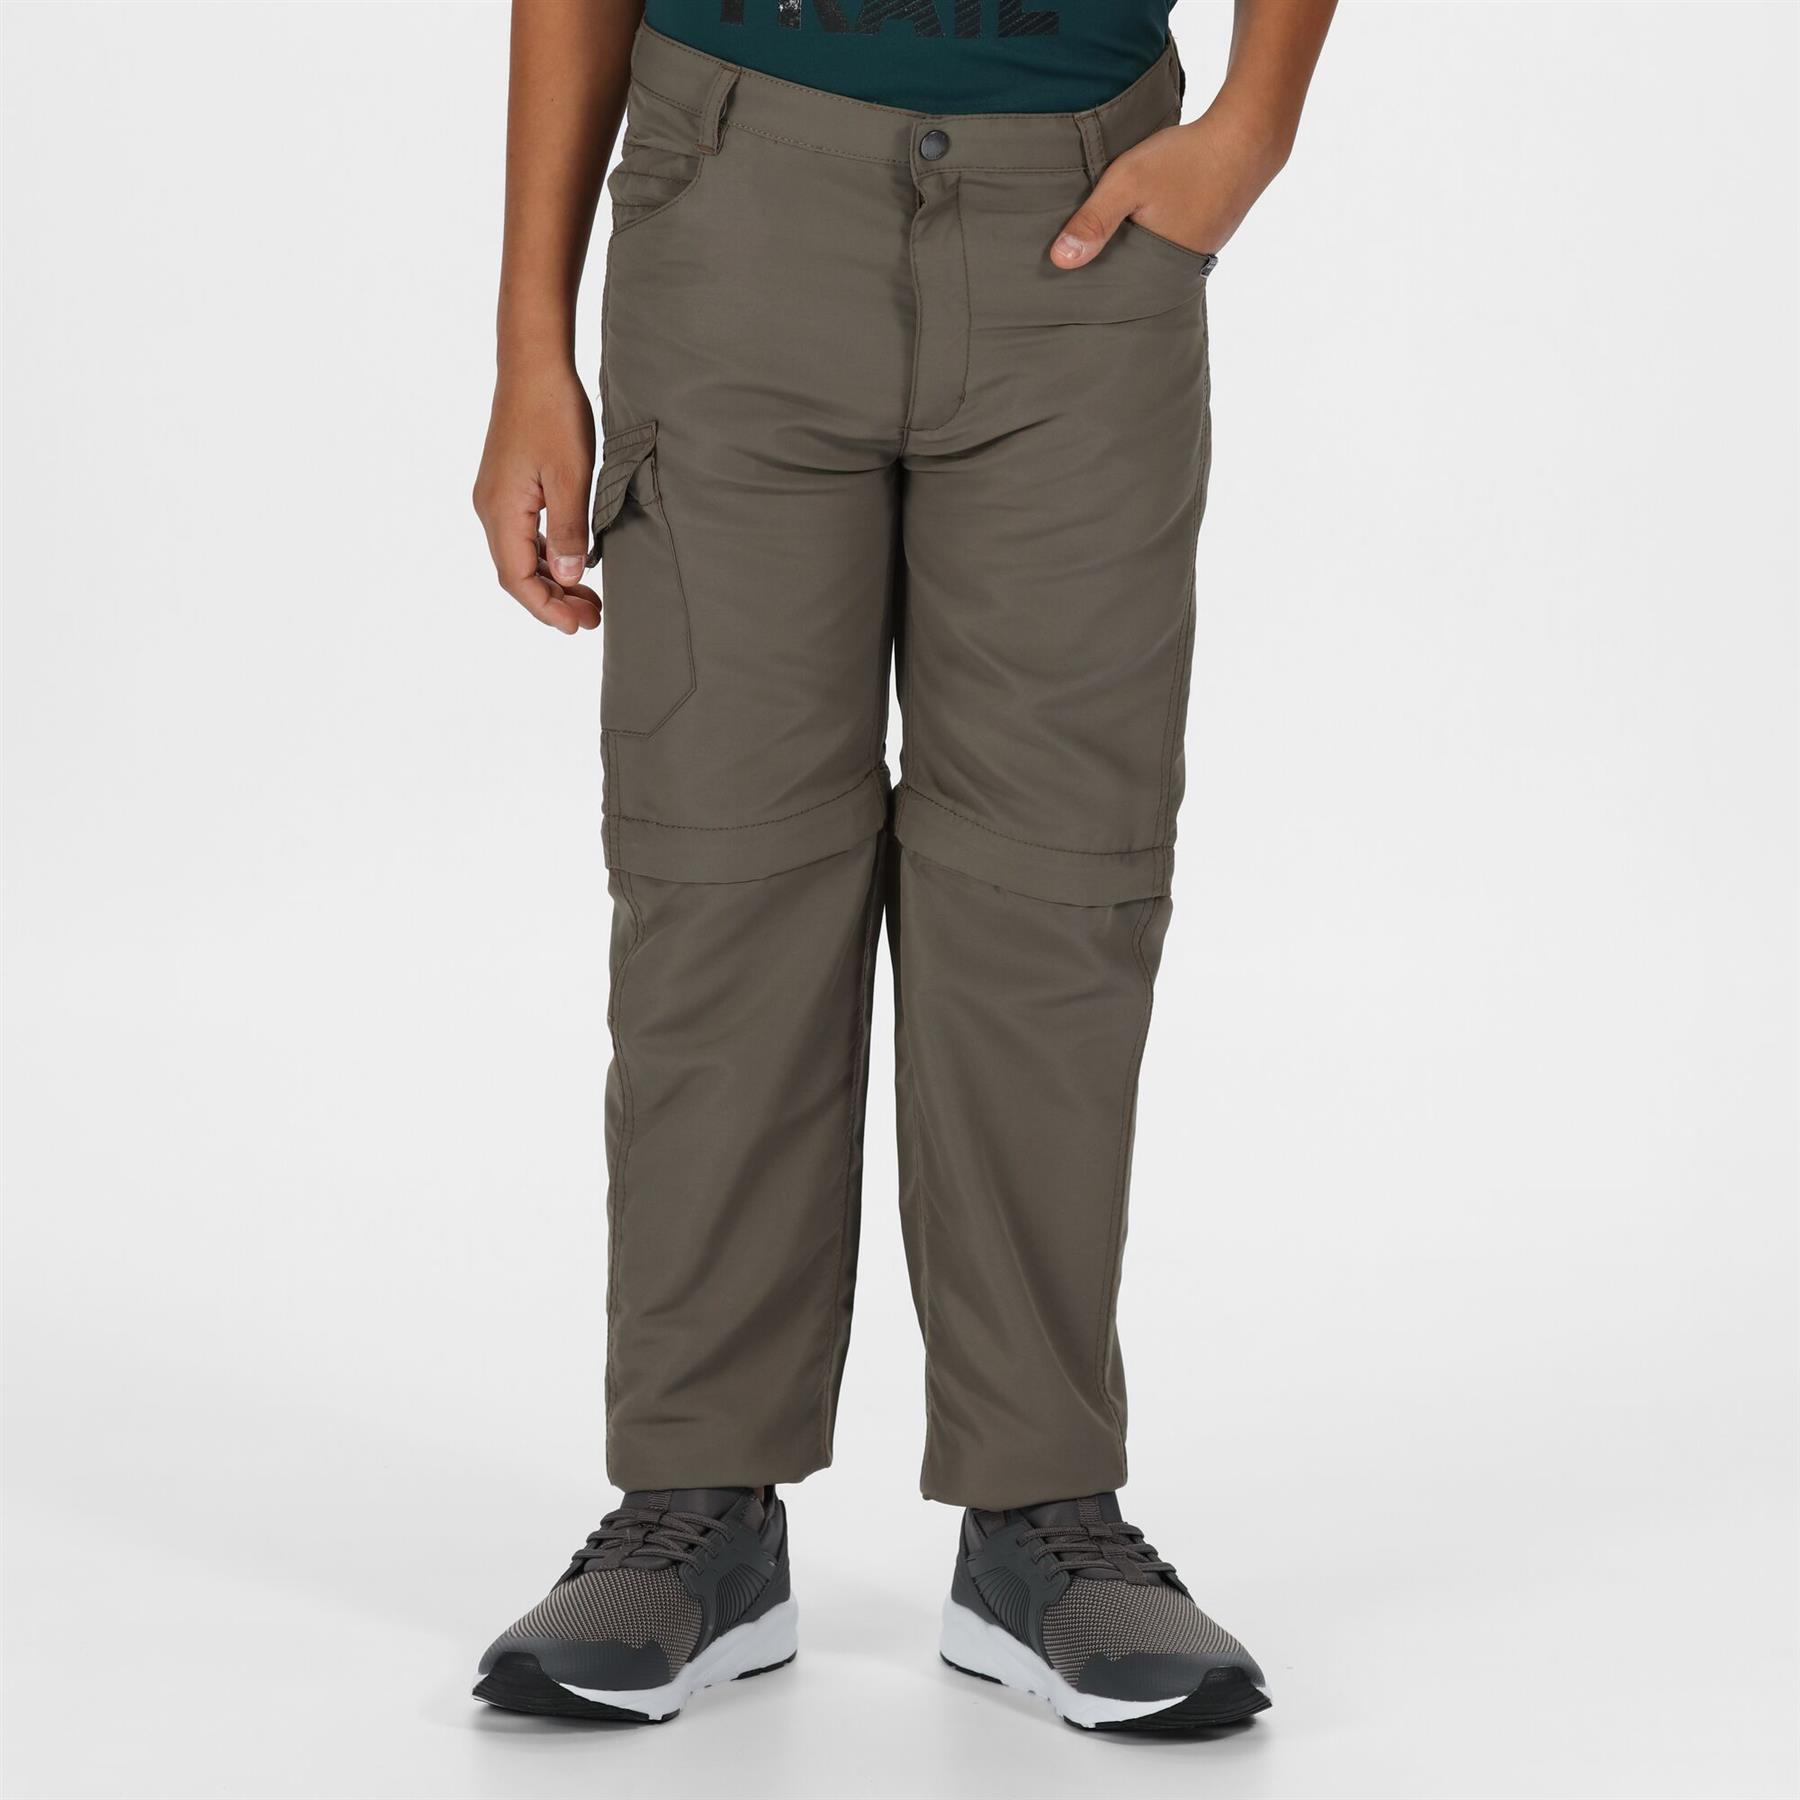 miniatuur 8 - Regatta Kids Sorcer II Zip Off Convertible Trousers Boys Girls